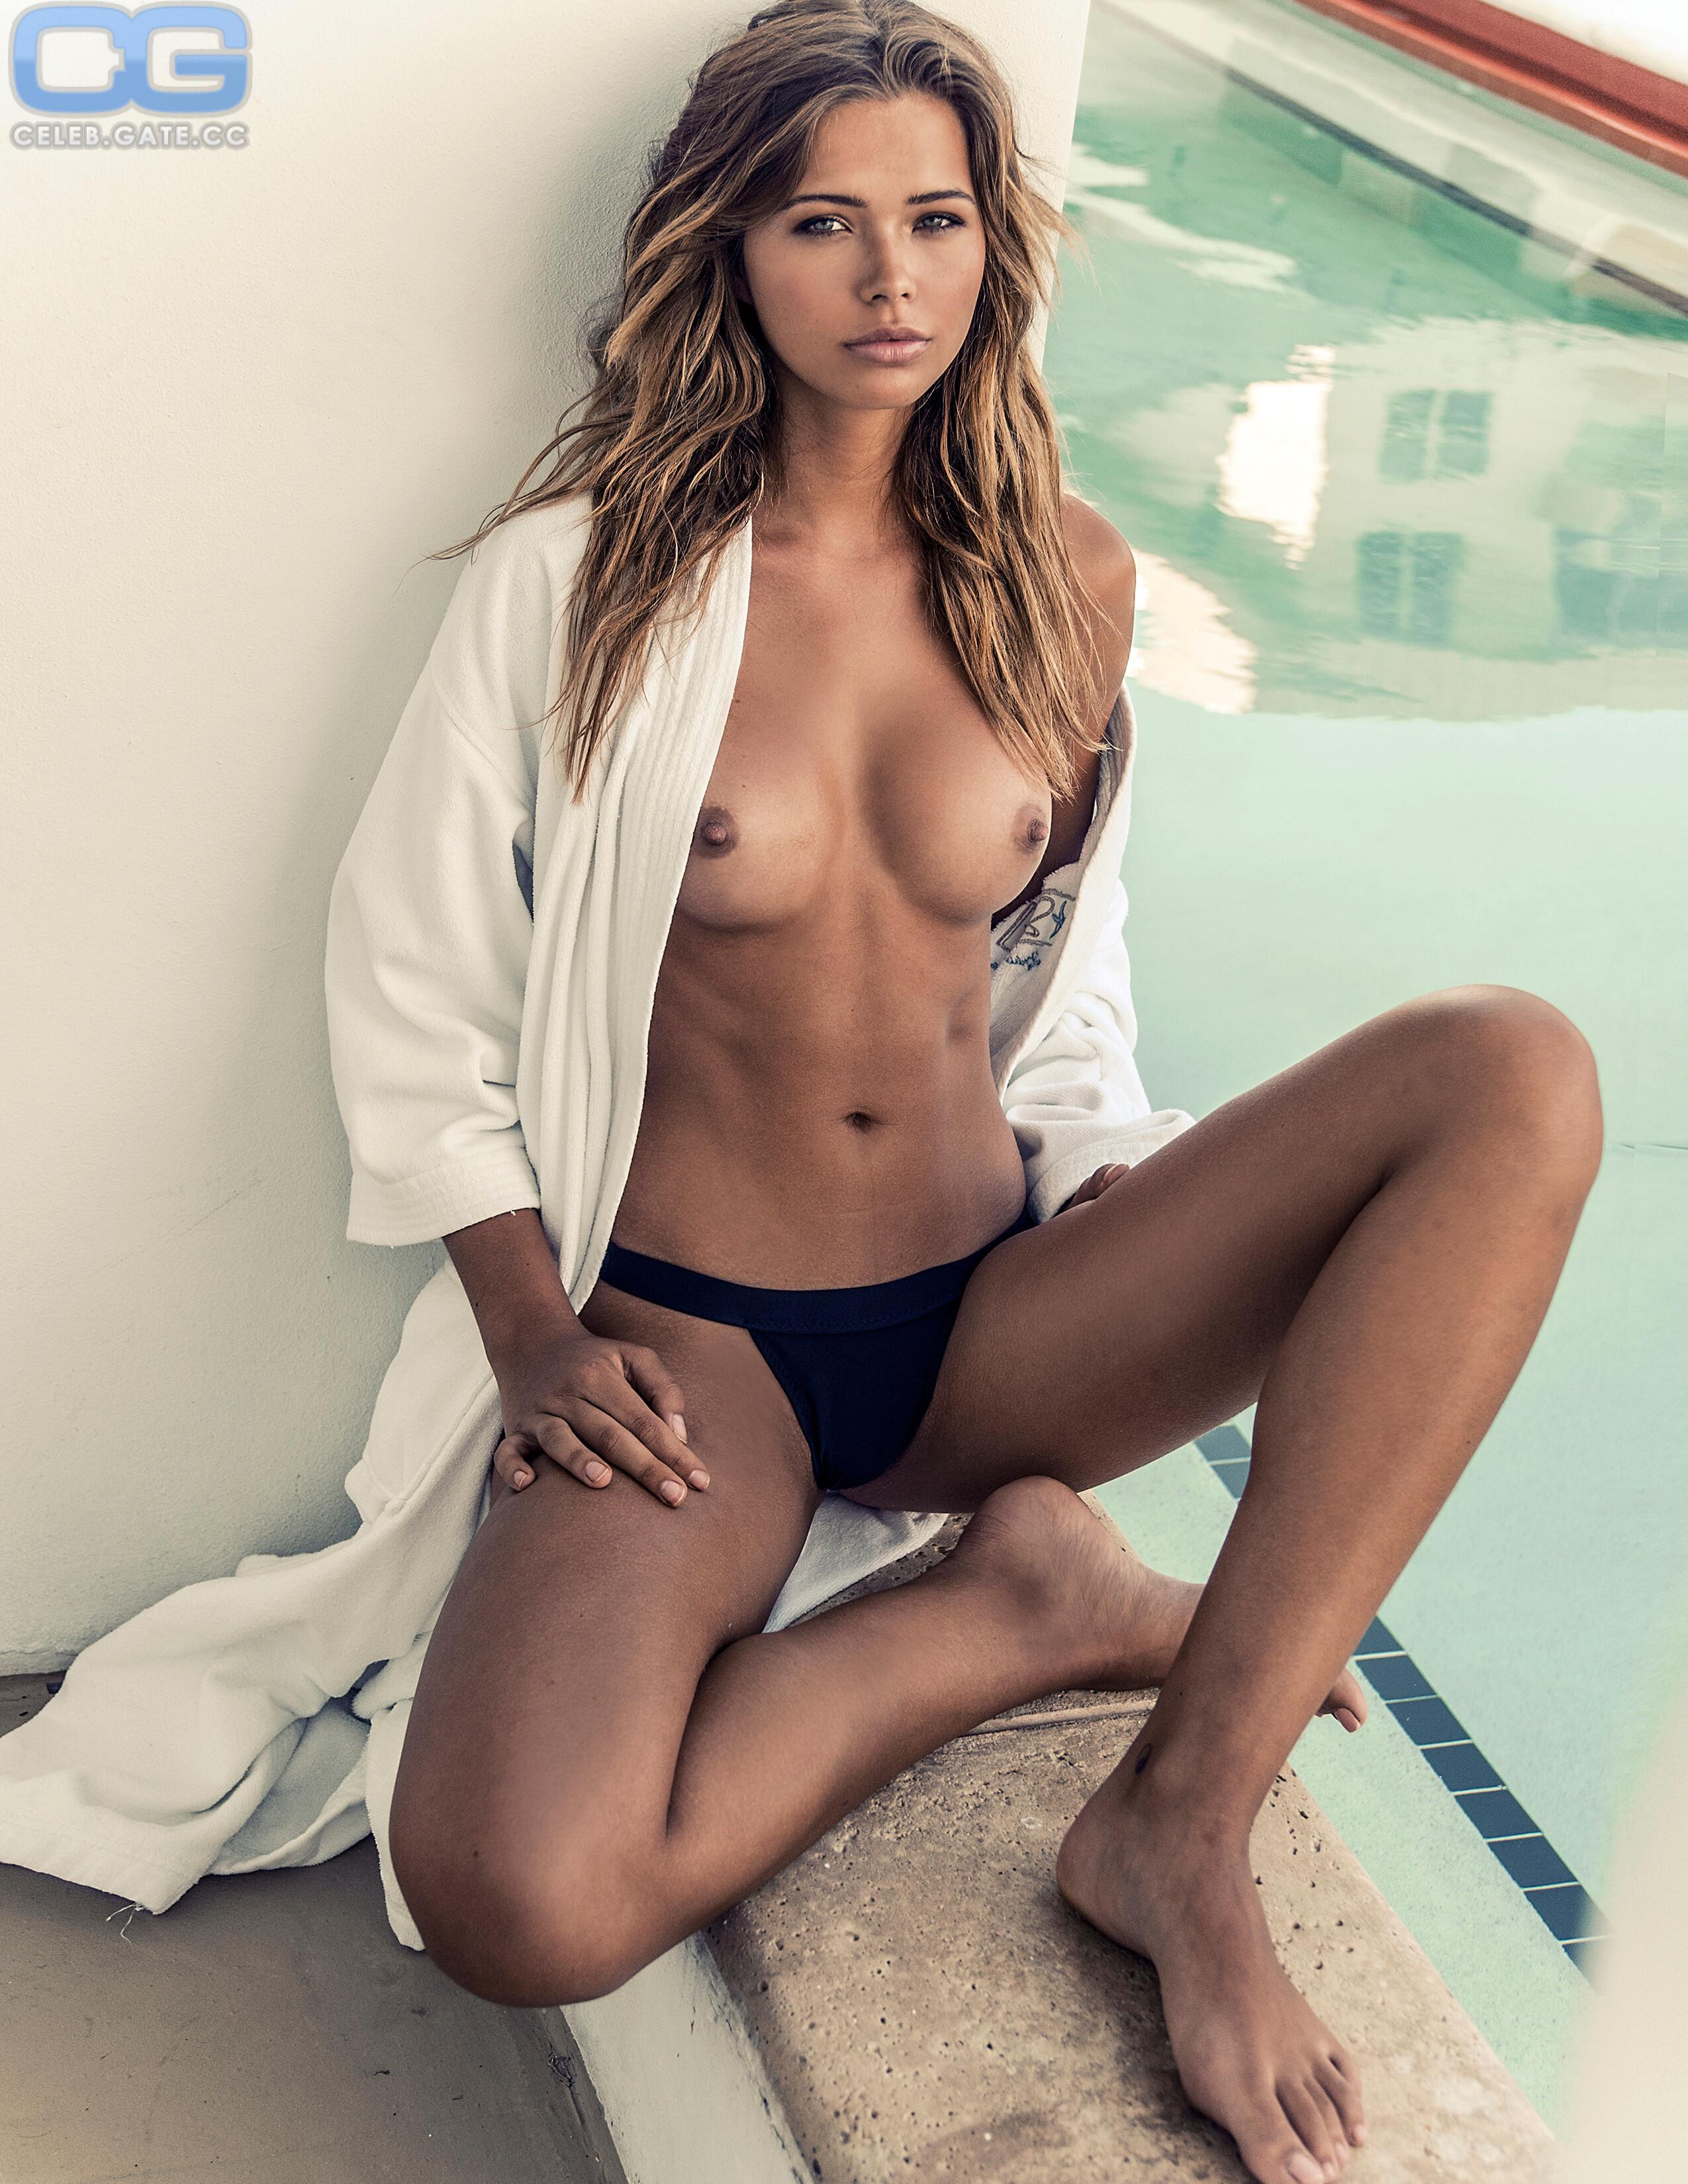 Sandra fox nackt